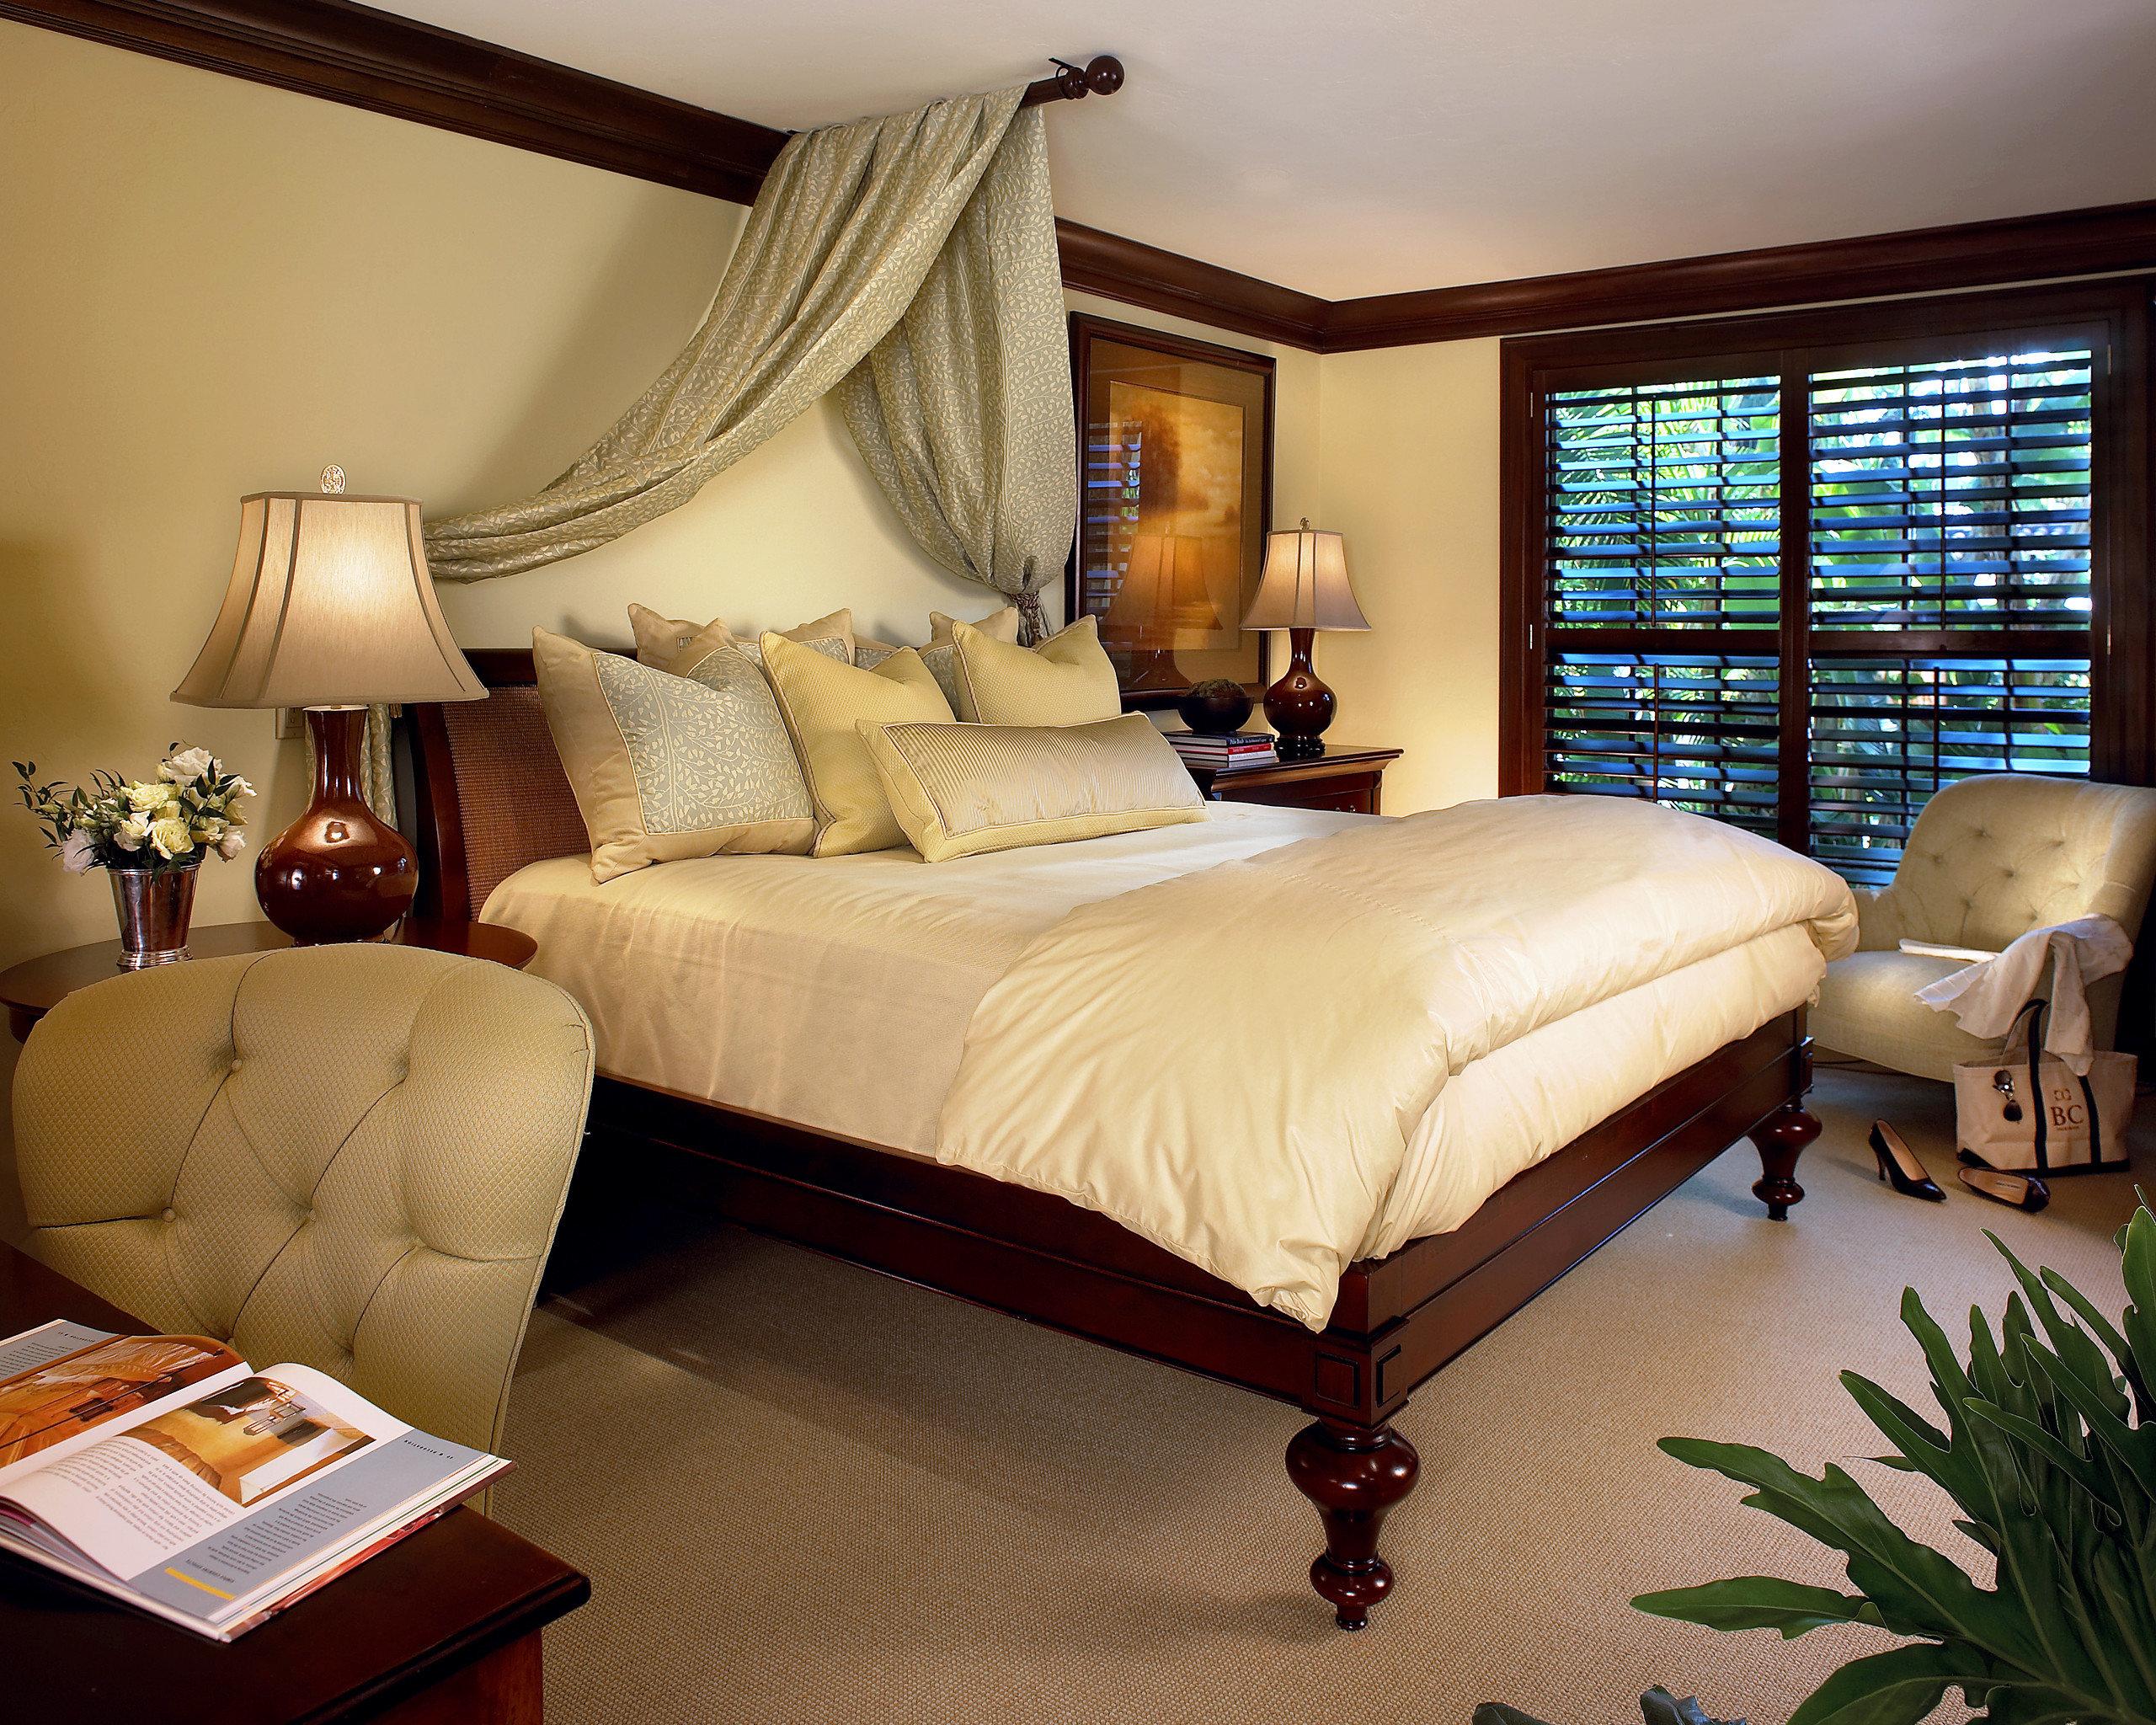 living room property Bedroom home hardwood bed sheet bed frame studio couch Suite